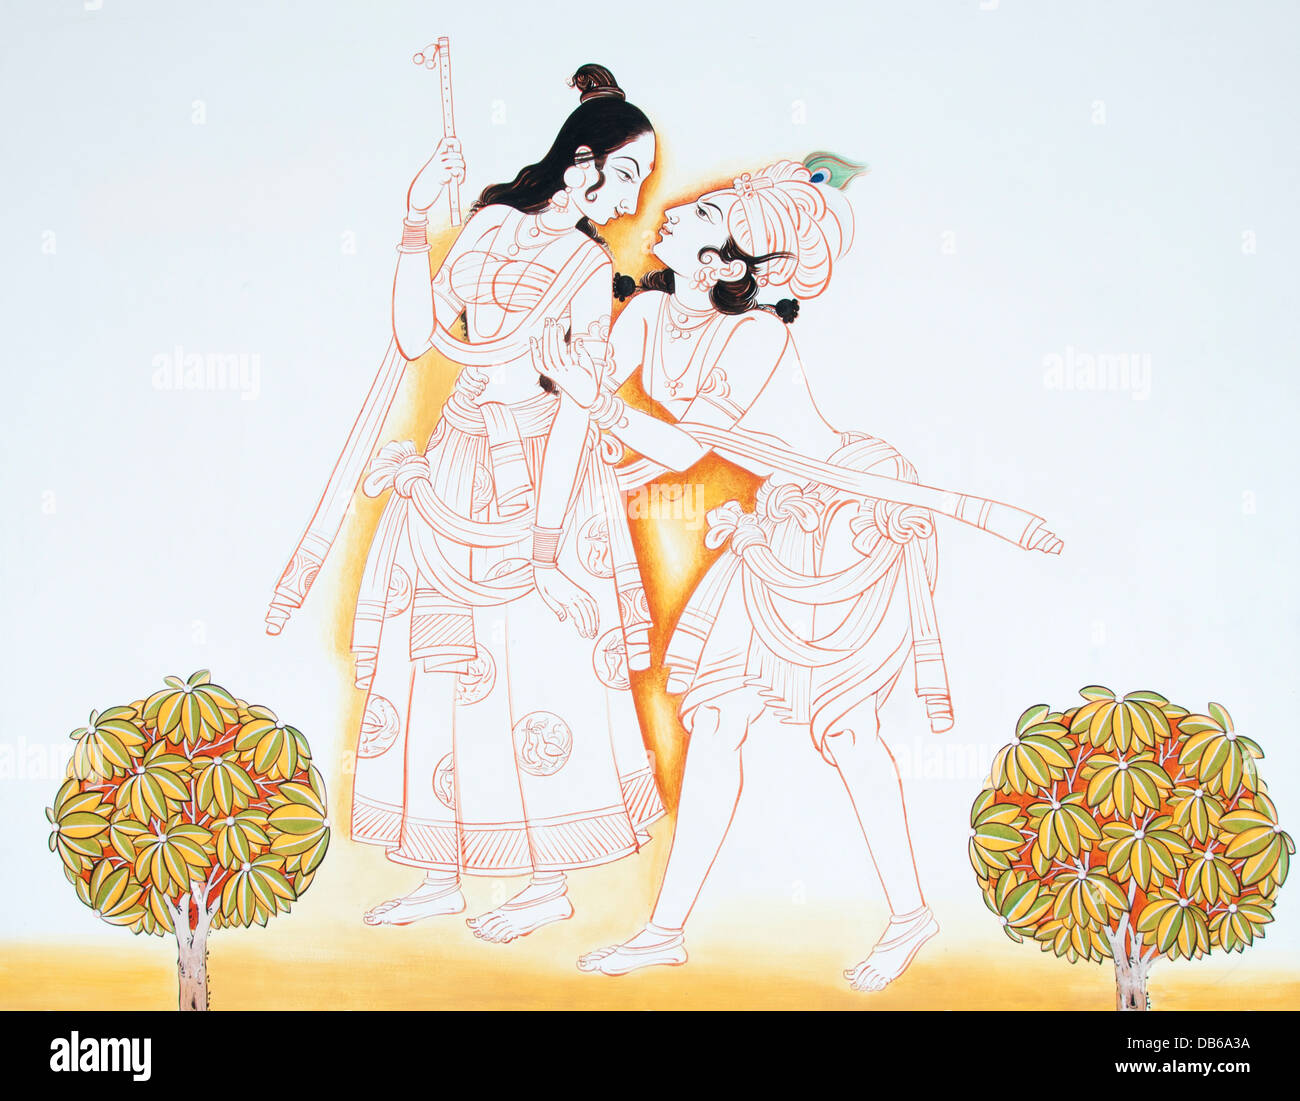 God Krishna embracing his devotee Radha - Stock Image